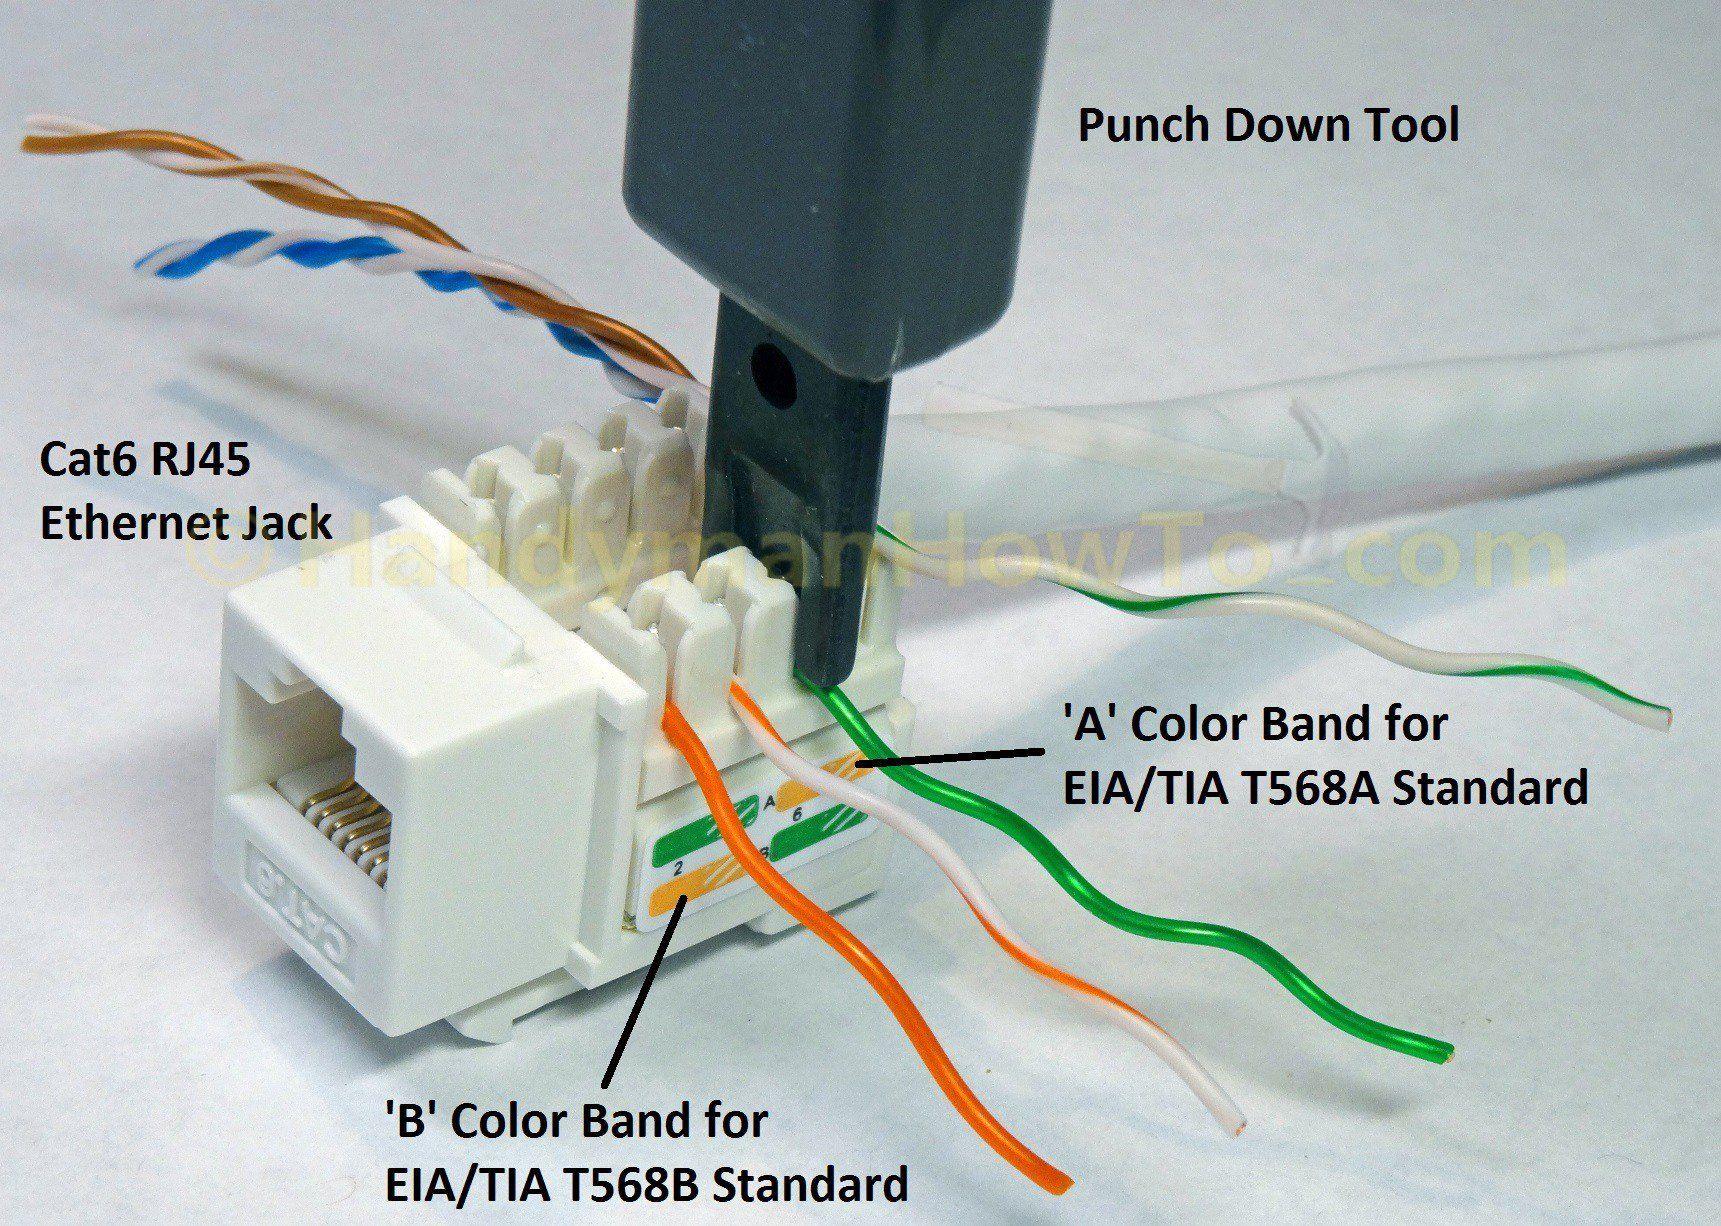 [DIAGRAM_38YU]  T568b Jack Wiring Diagram - Suzuki 185 Wiring Diagram for Wiring Diagram  Schematics | T568b Rj45 Wiring Diagram |  | Wiring Diagram Schematics